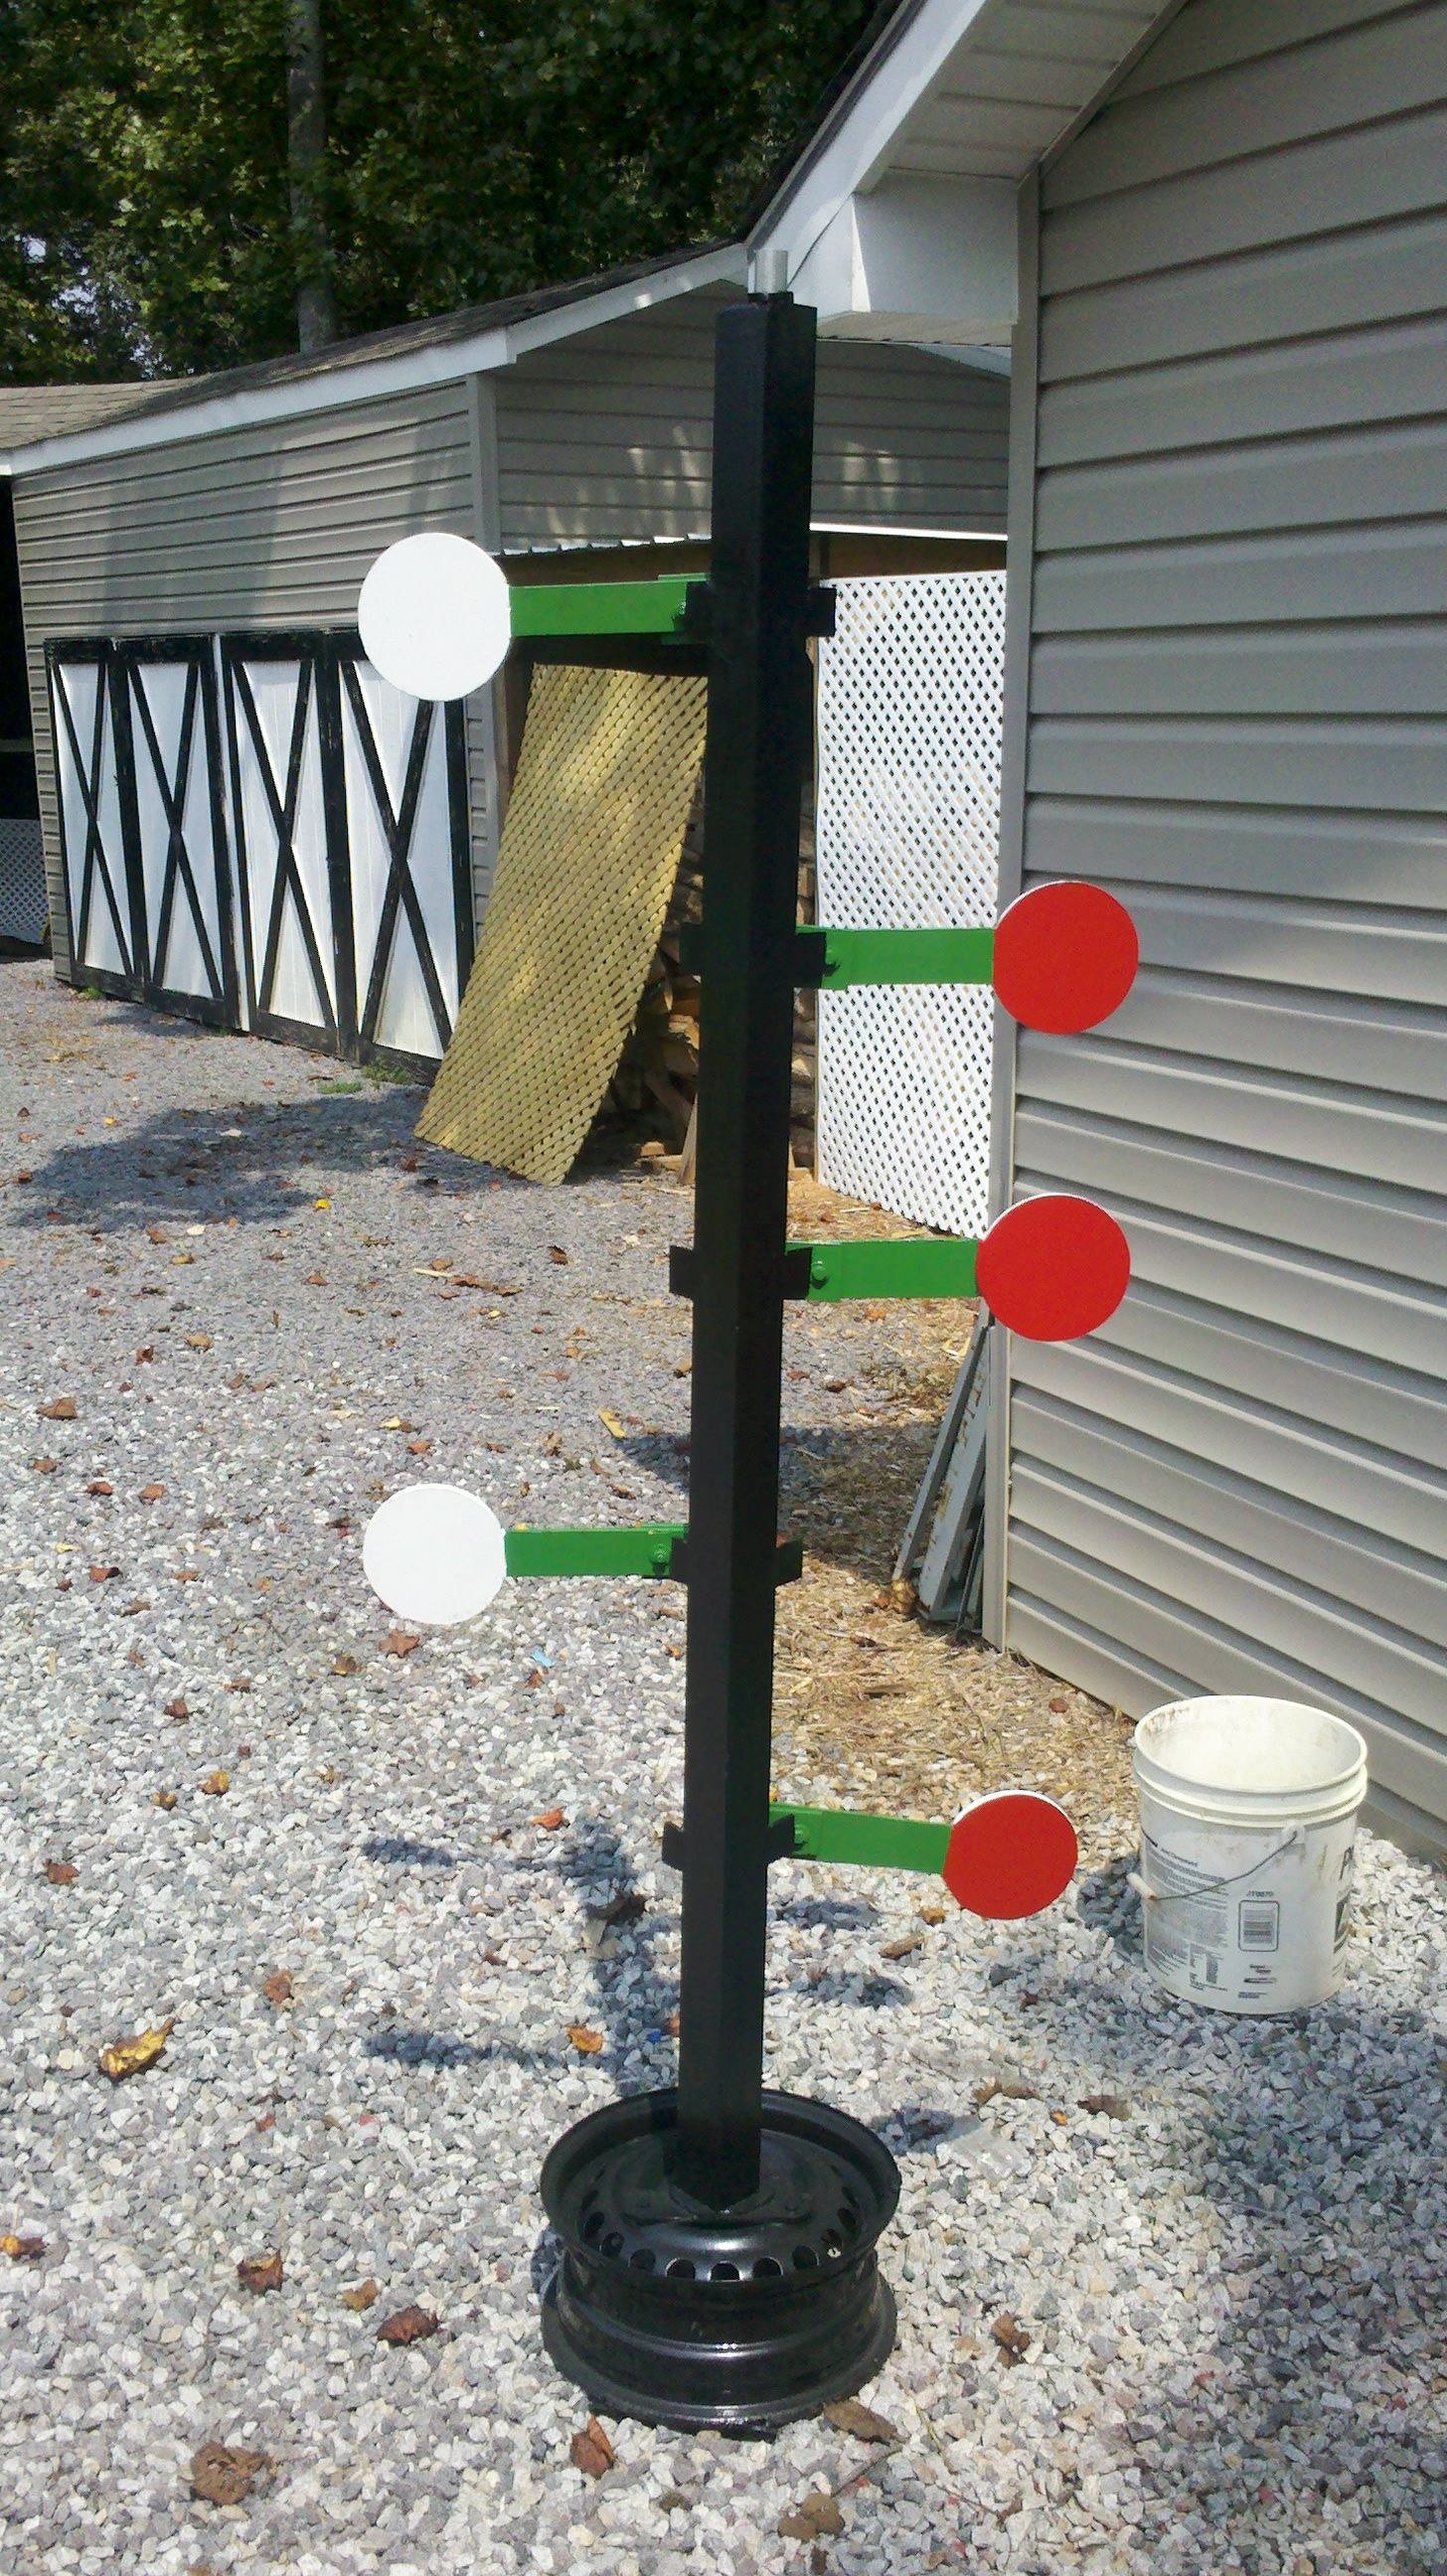 Dueling tree shooting targets shooting range outdoor